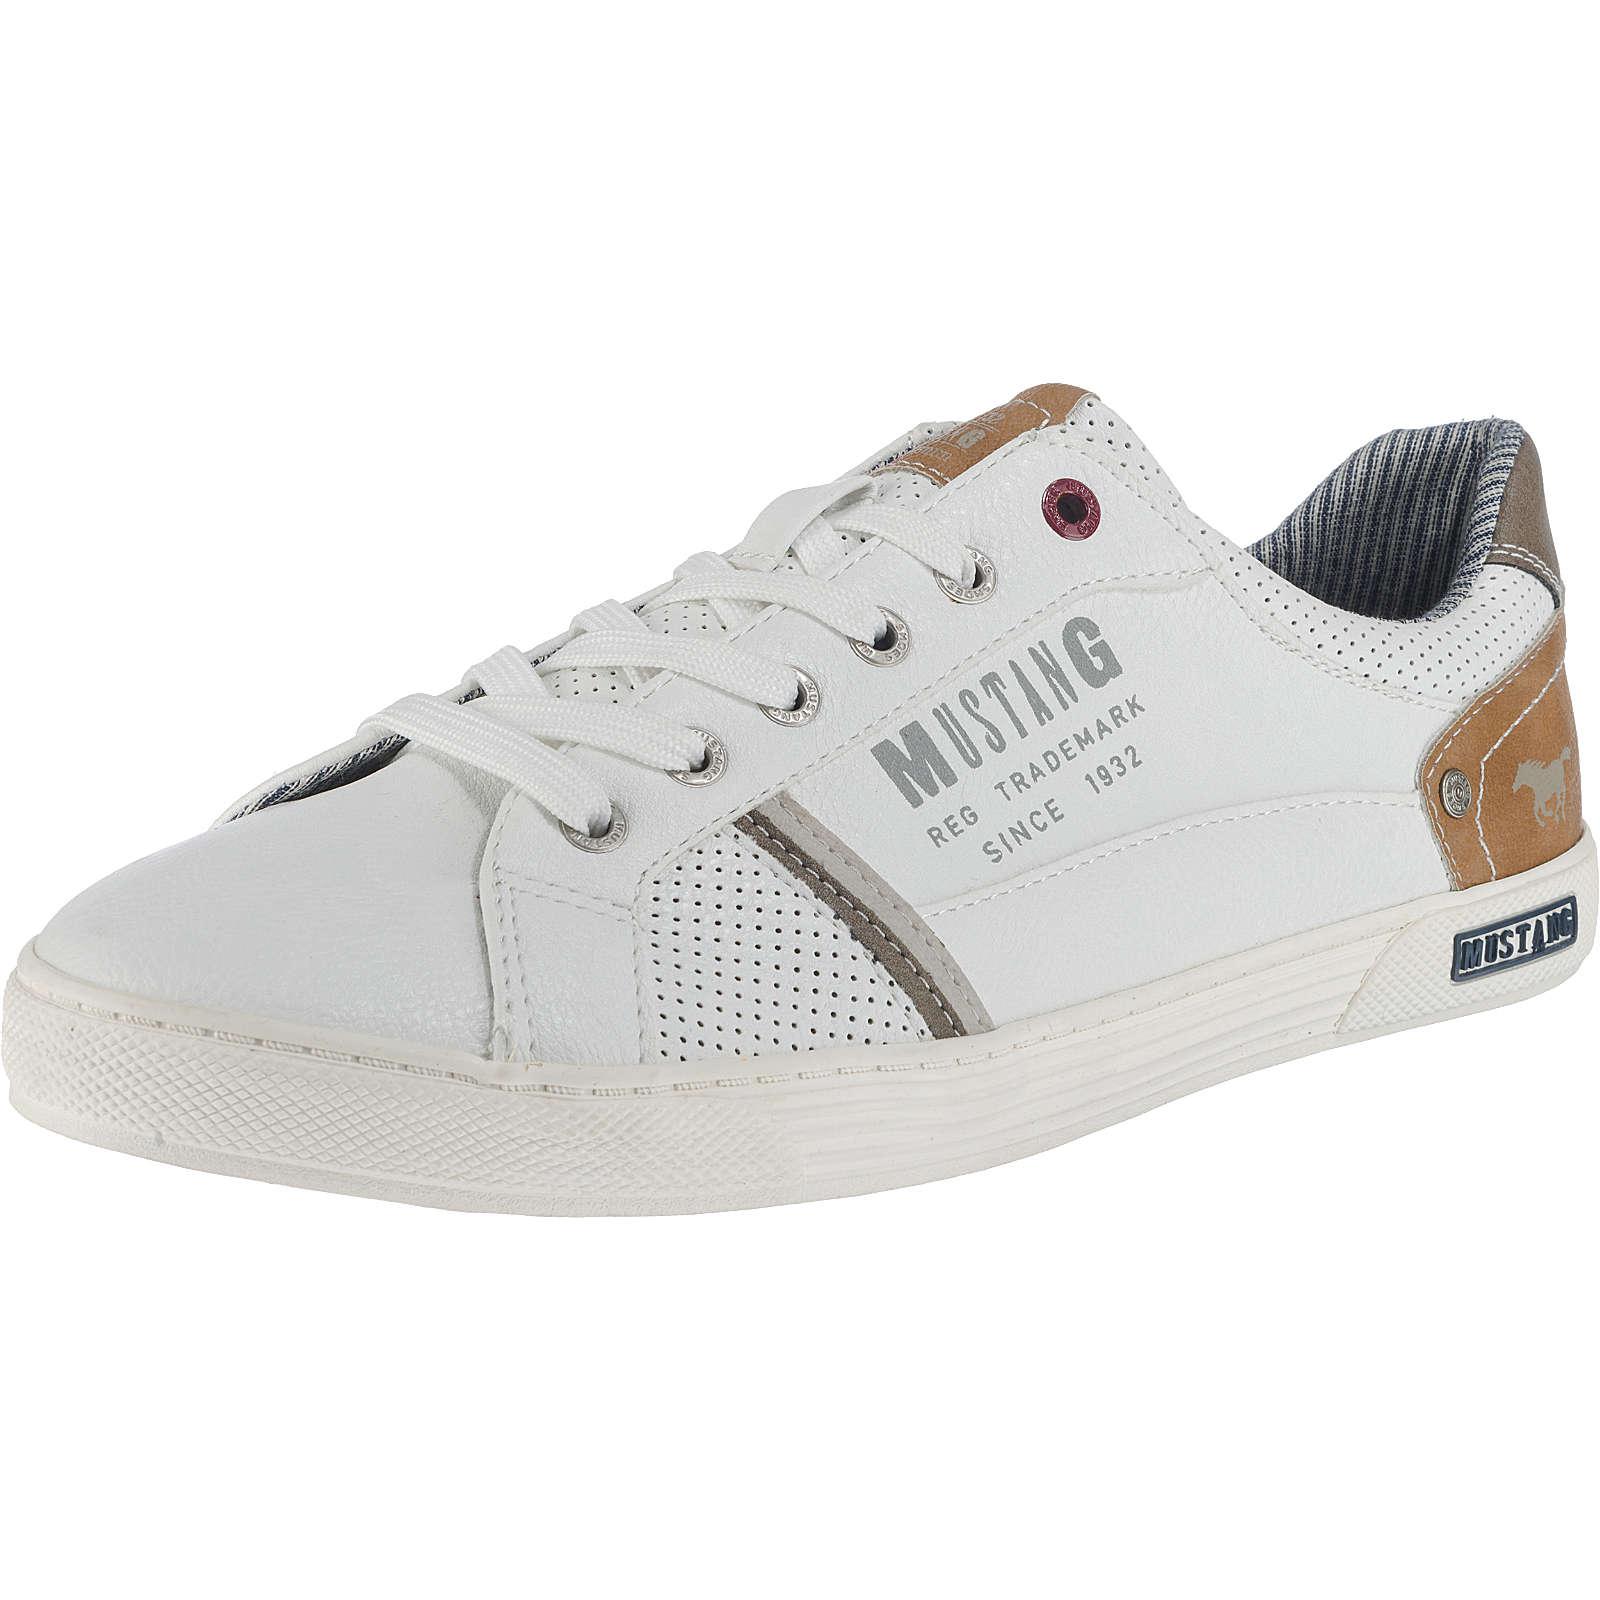 Image of 2 GO Shoe Company GmbH 4120 302 1 Größe 43 Grau (Grau)